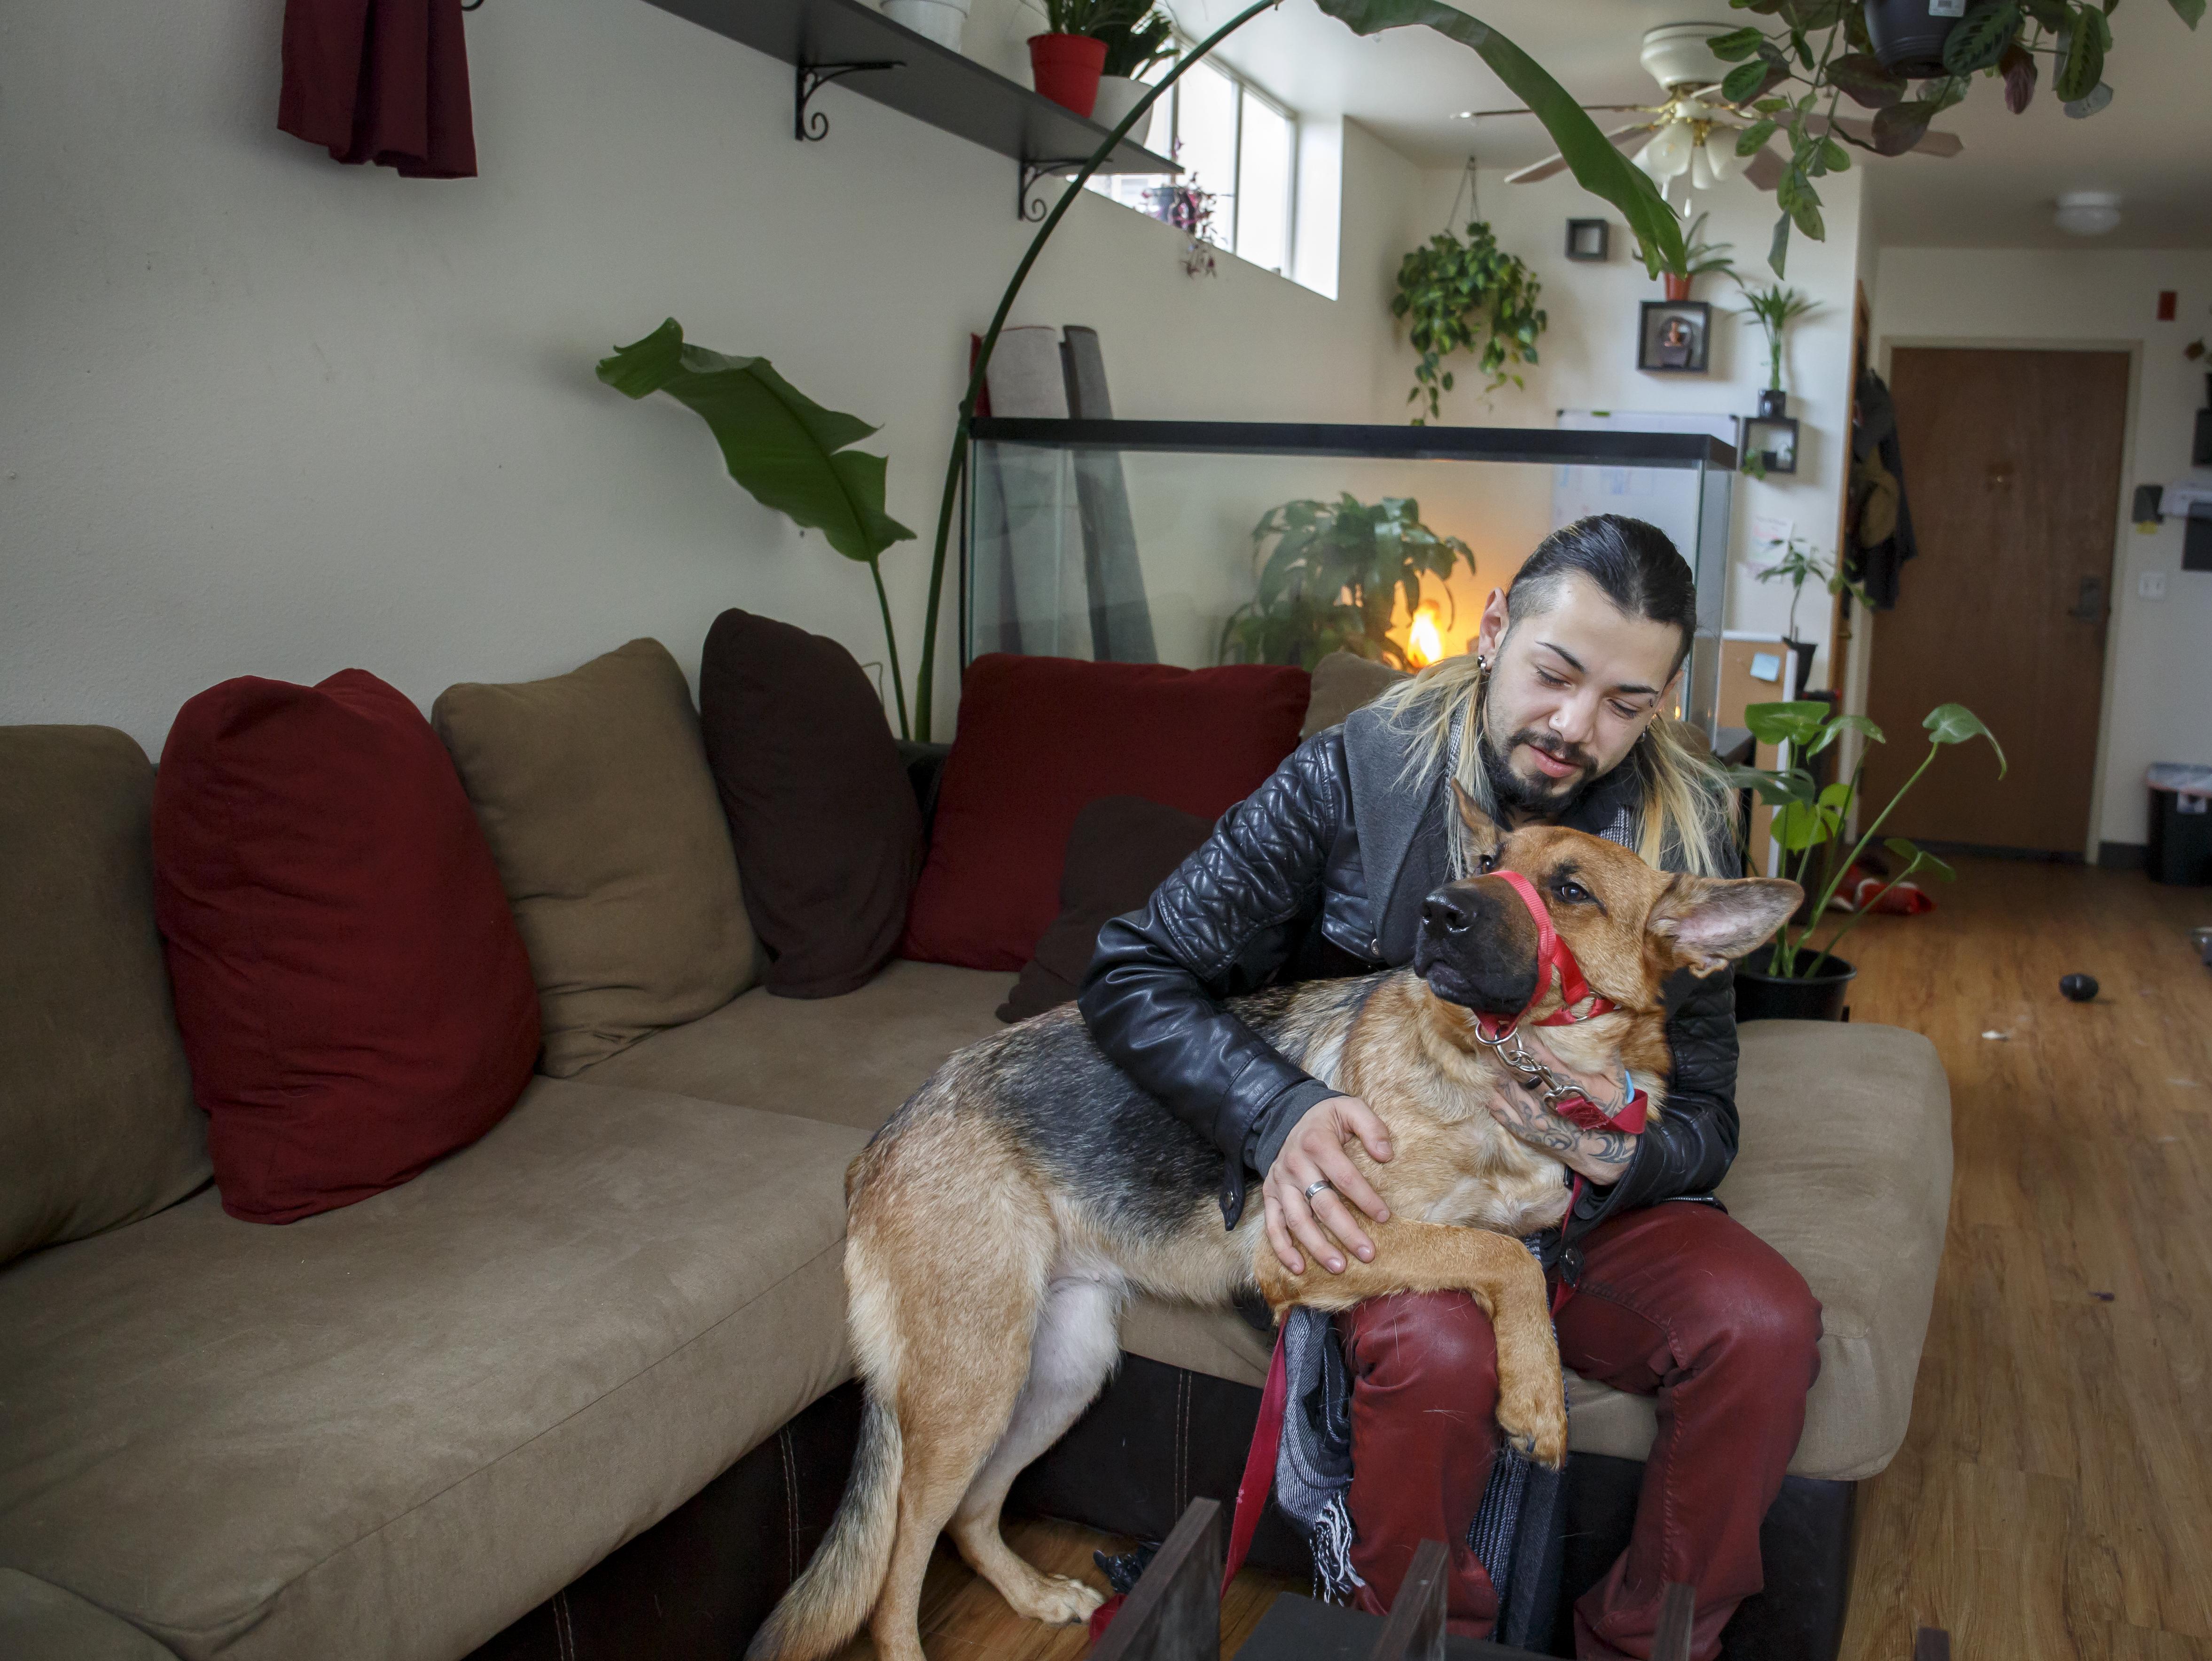 Leonardo Cruz and his emotional support dog, Aurora, at their home in Portland, Friday, Jan. 22, 2021.